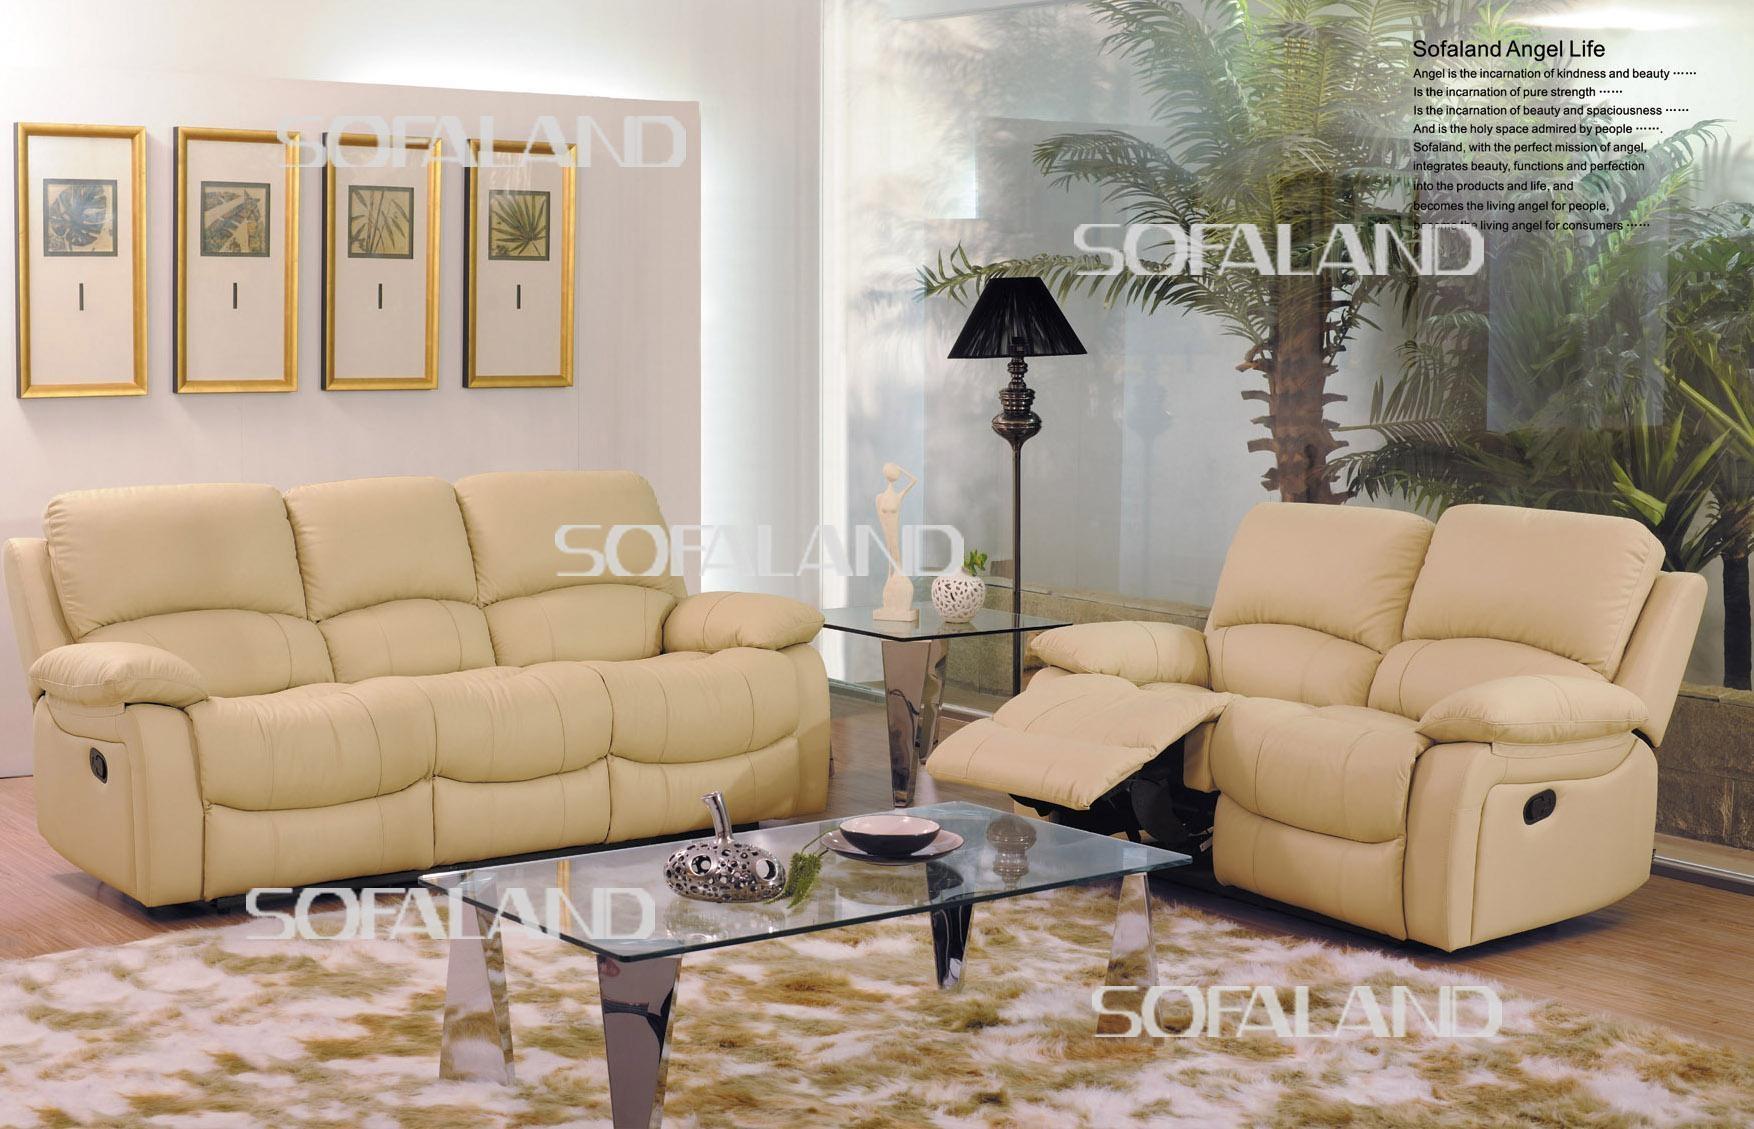 20 Inspirations Cream Colored Sofas | Sofa Ideas Throughout Cream Colored Sofas (View 4 of 15)